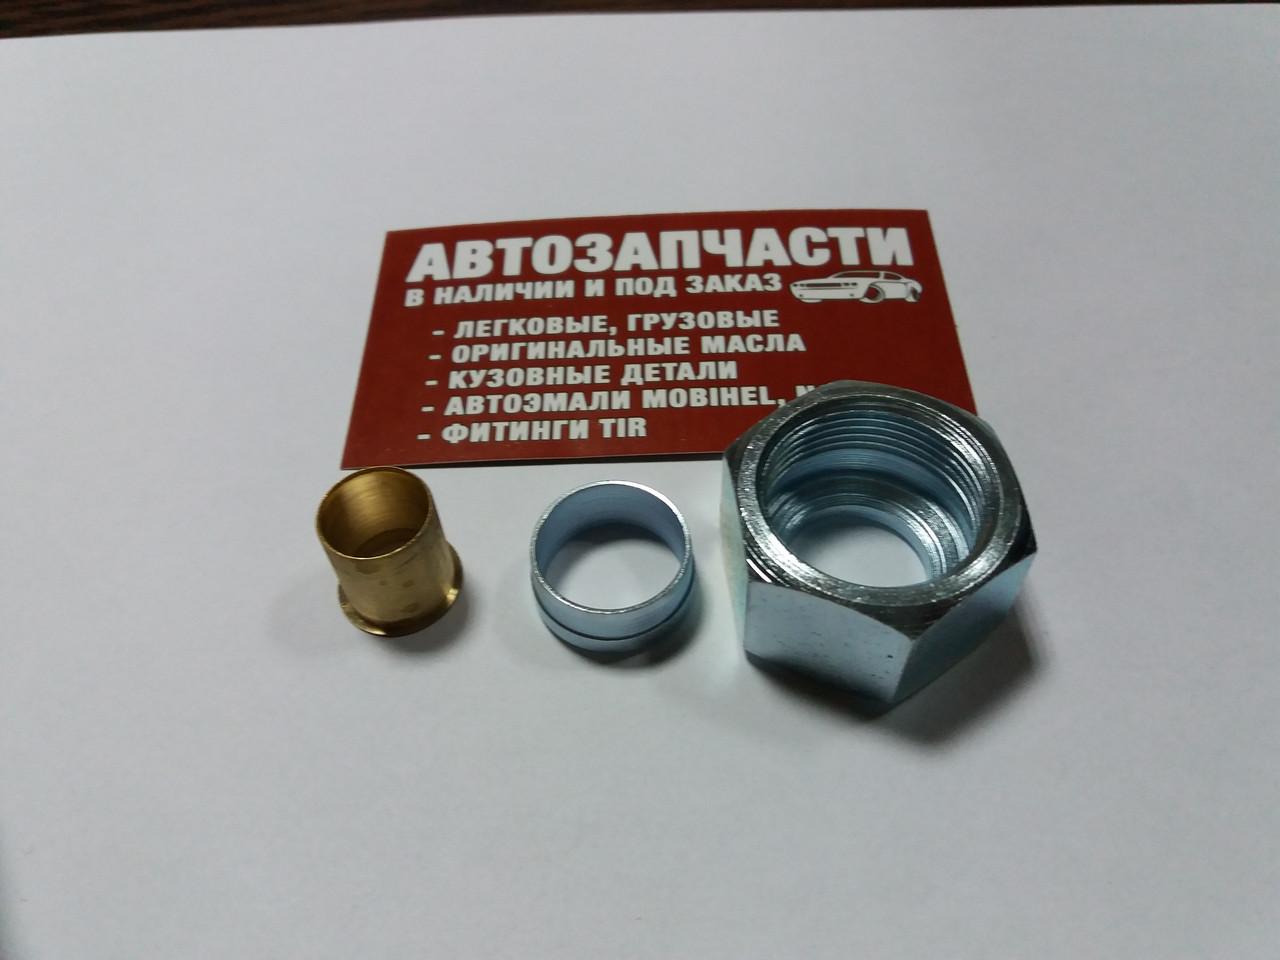 Ремкомплект трубки пластиковой Д18 М26х1.5